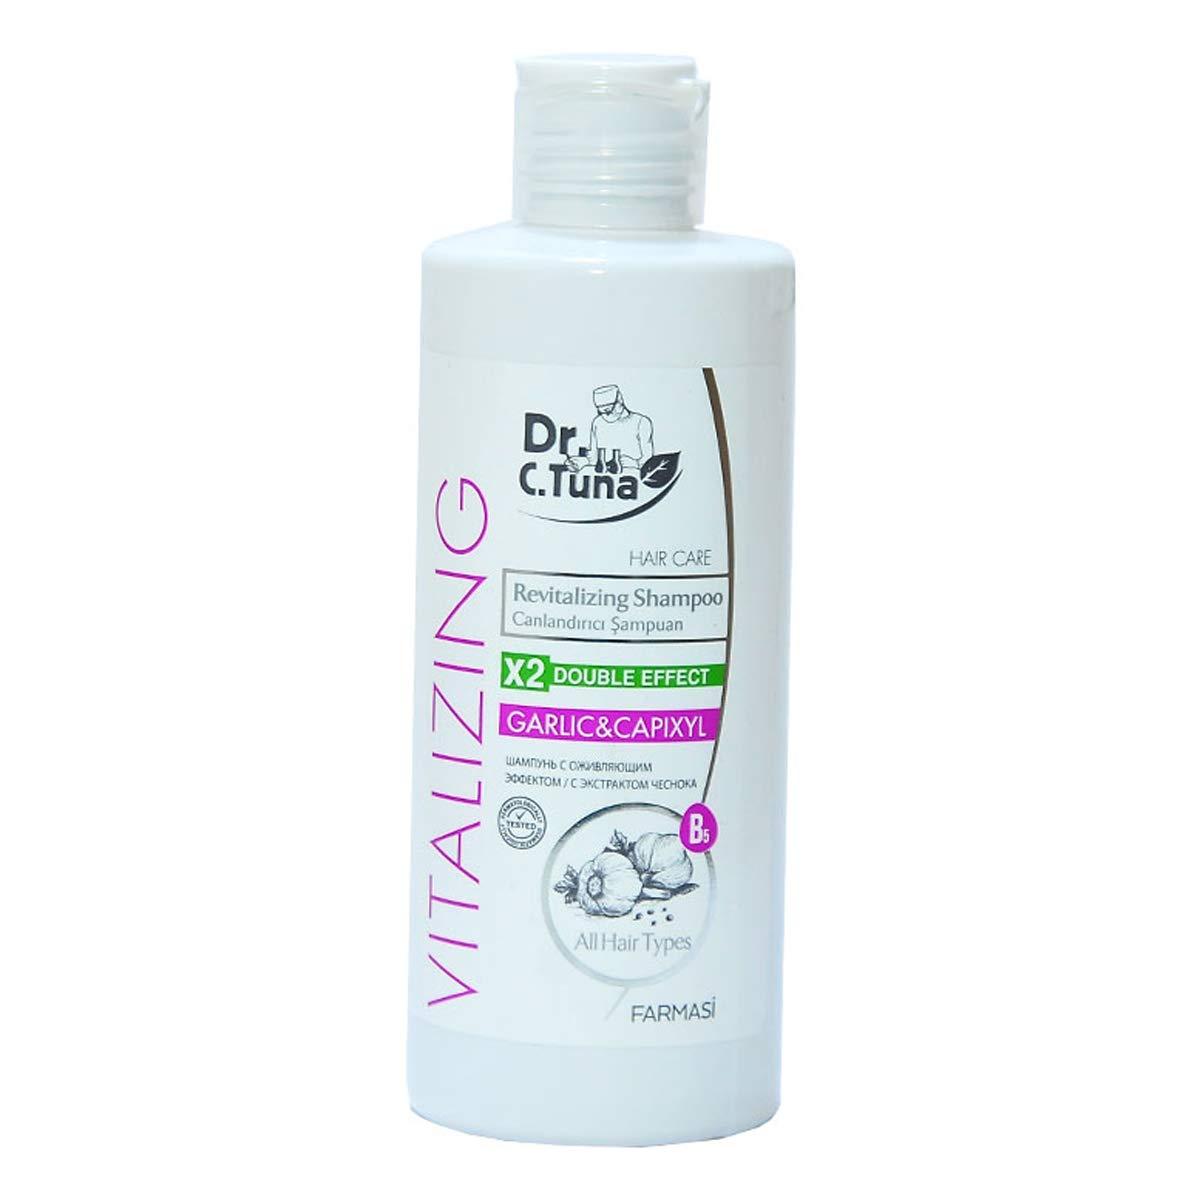 Dr C Tuna Vitalizing Garlic & Capixyl Shampoo 225 ml